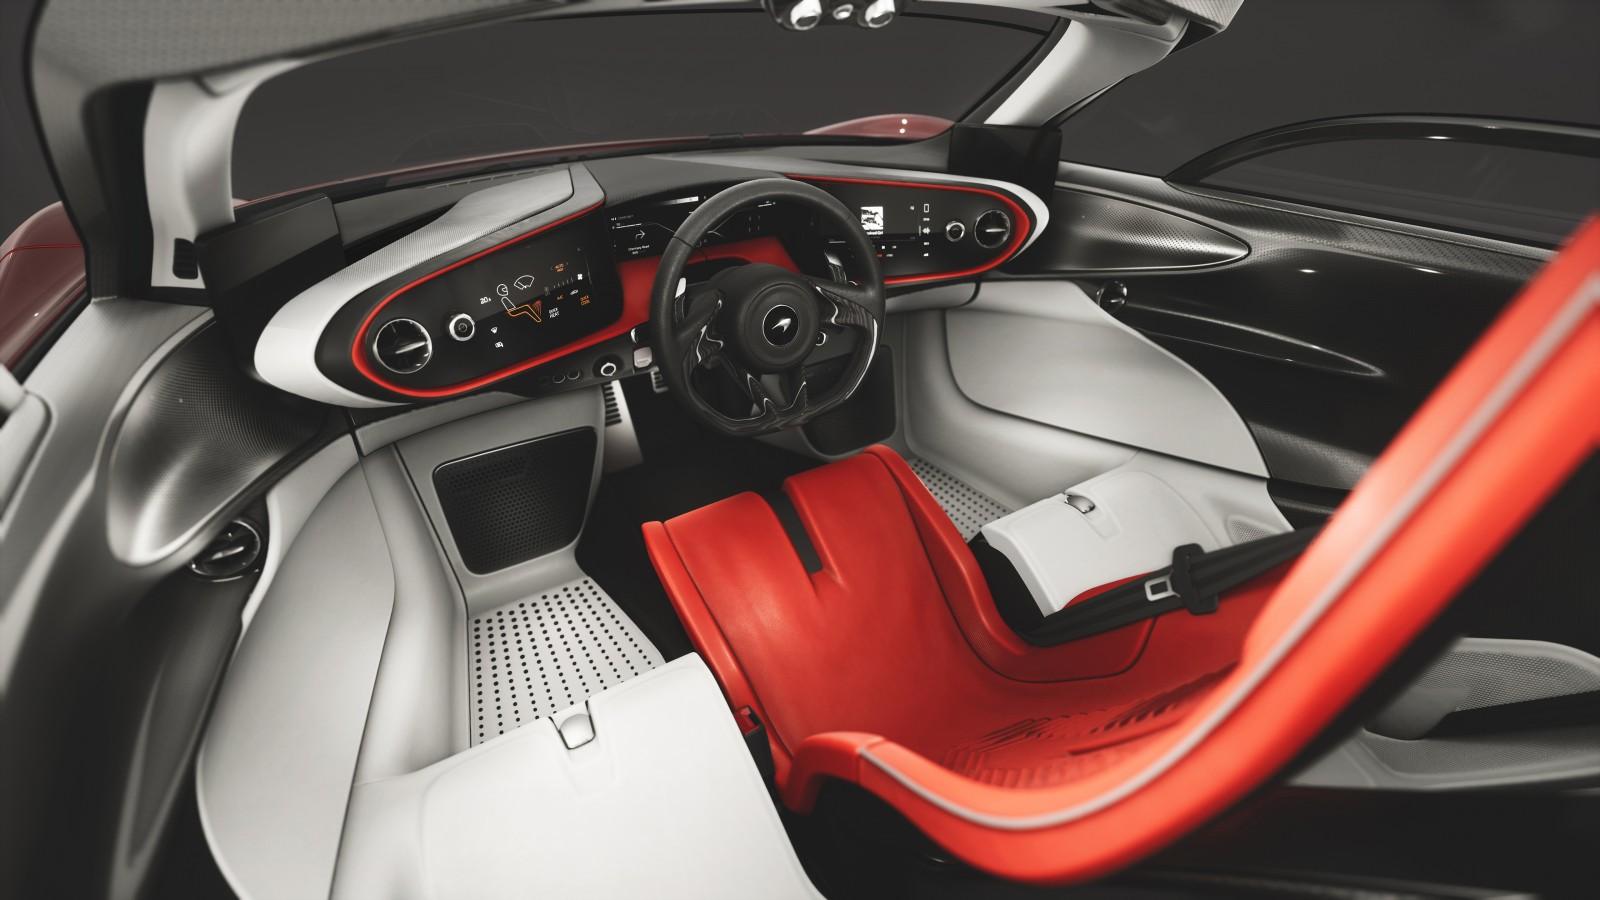 Mclaren Speedtail Interior 2019 4k 5k Wallpaper Hd Car